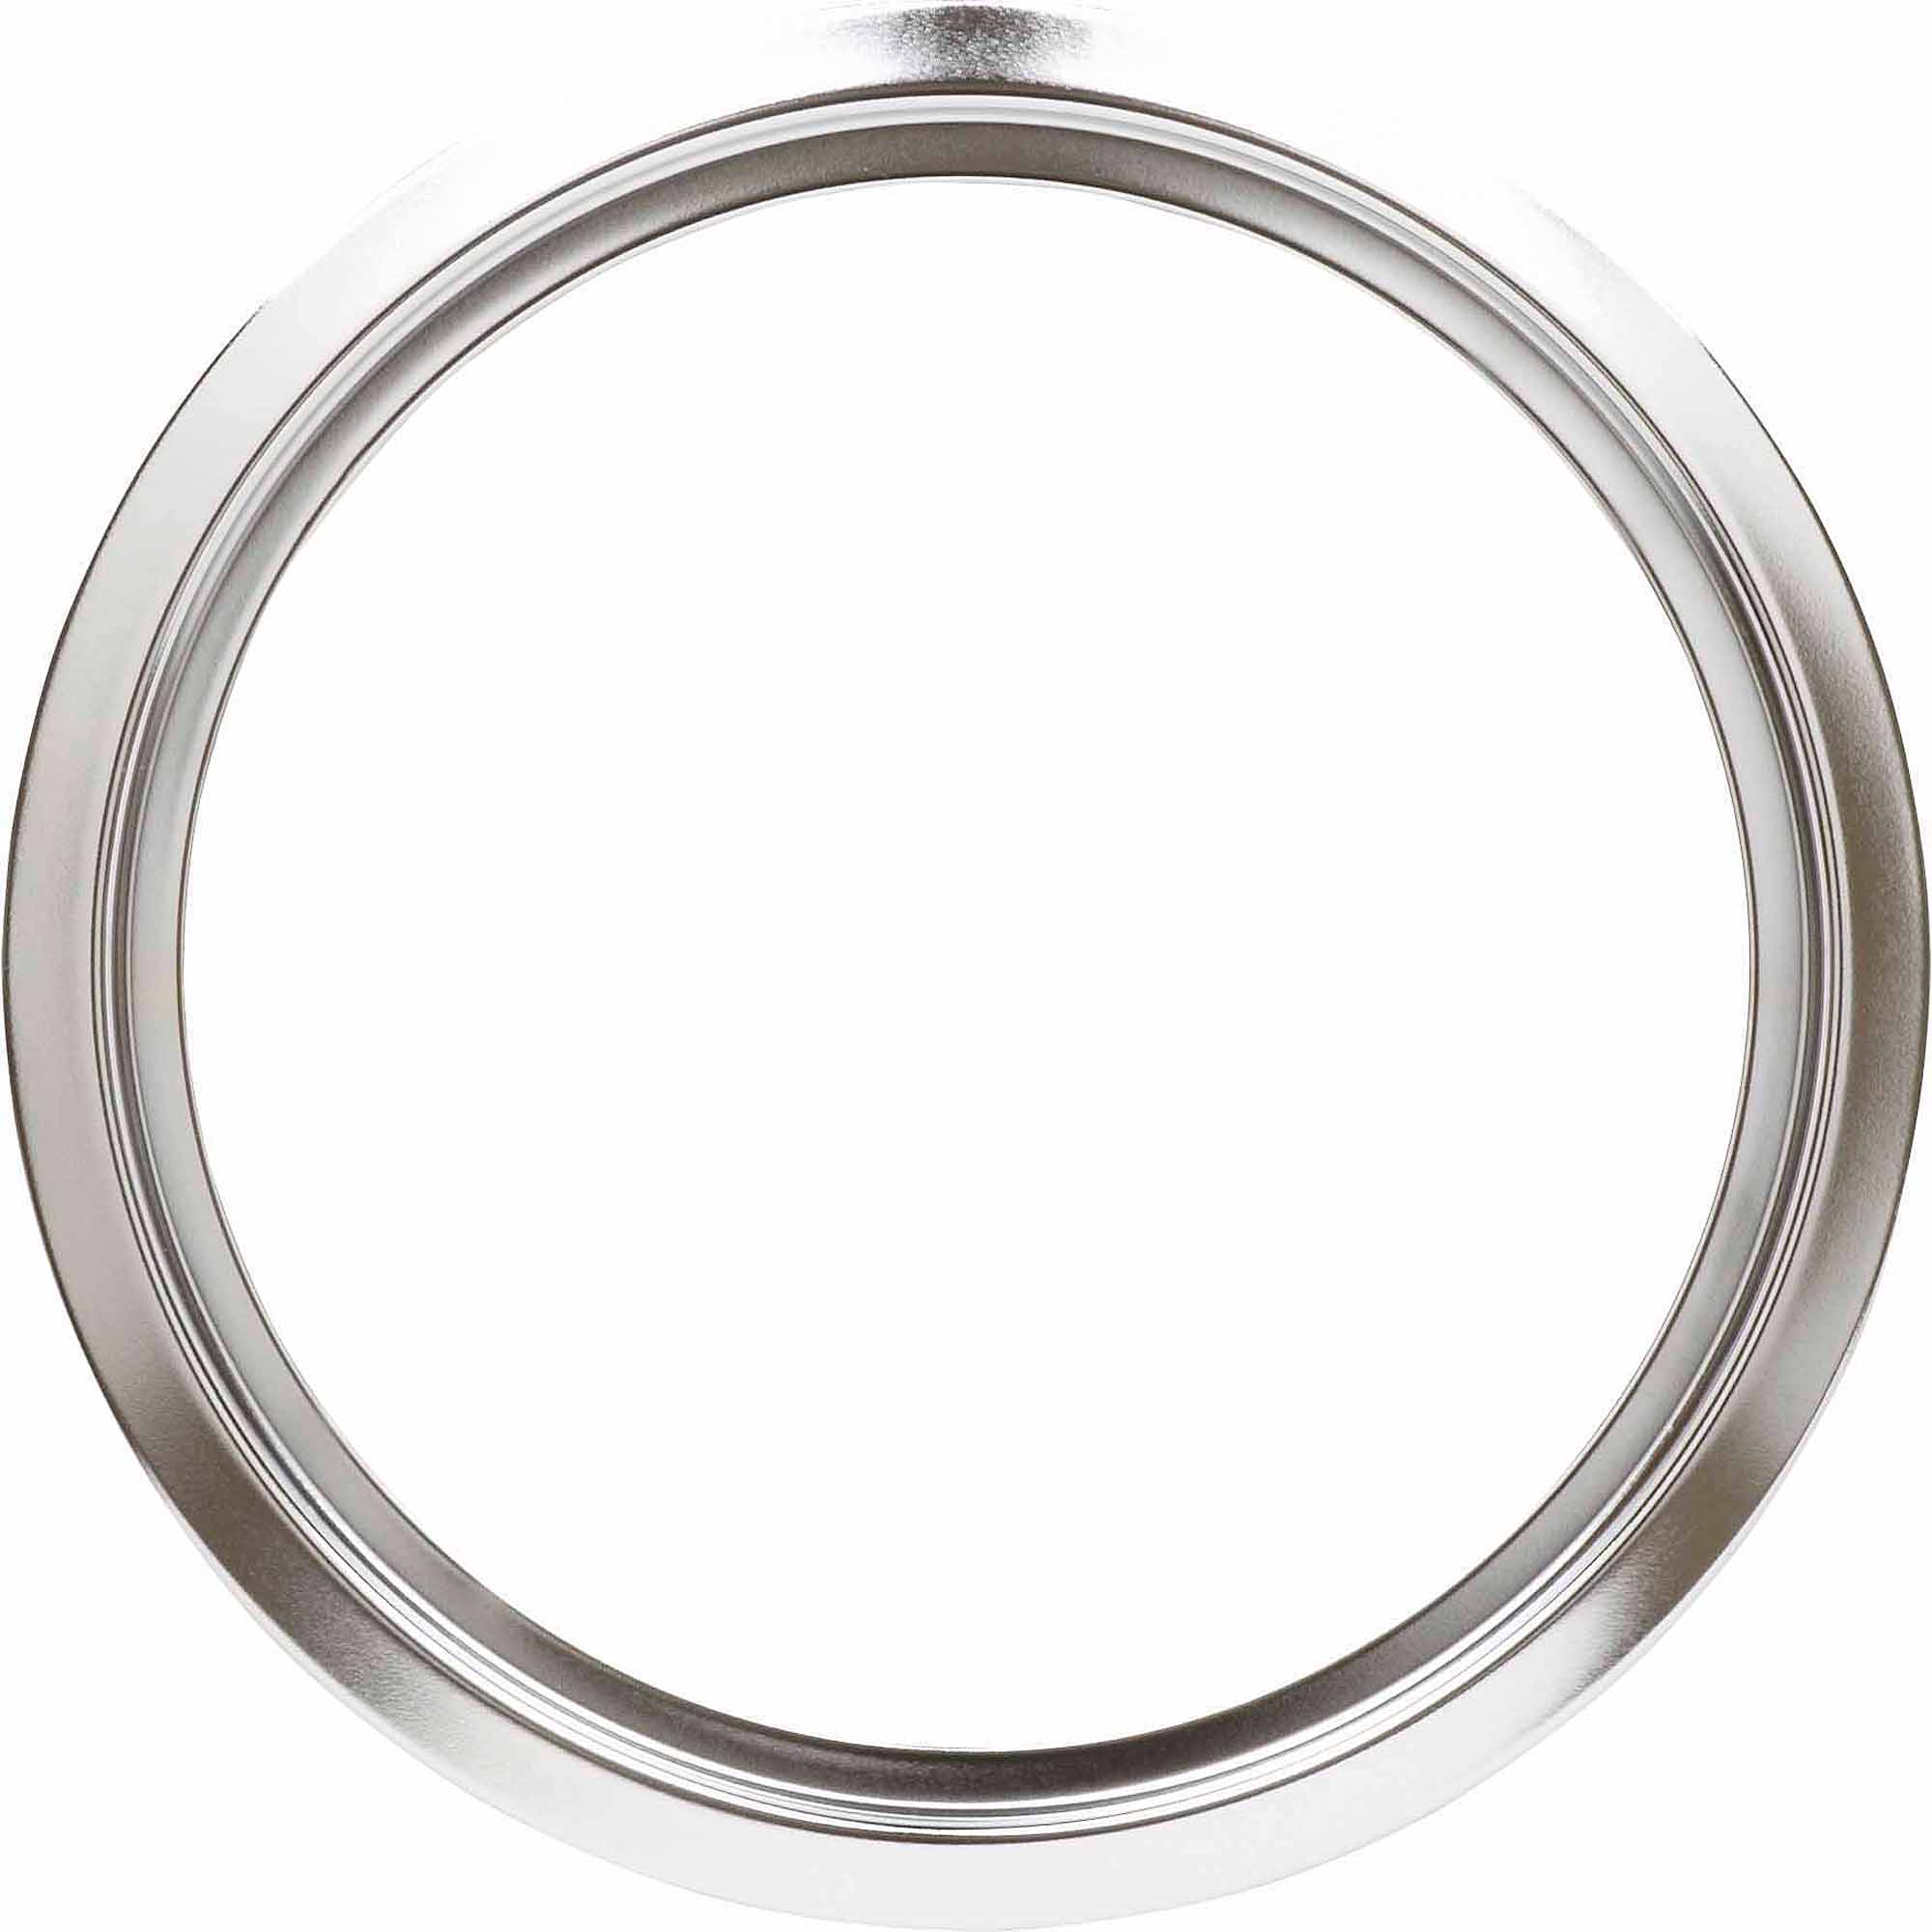 "GE Stove Chrome Trim Ring, 8"", Chrome"